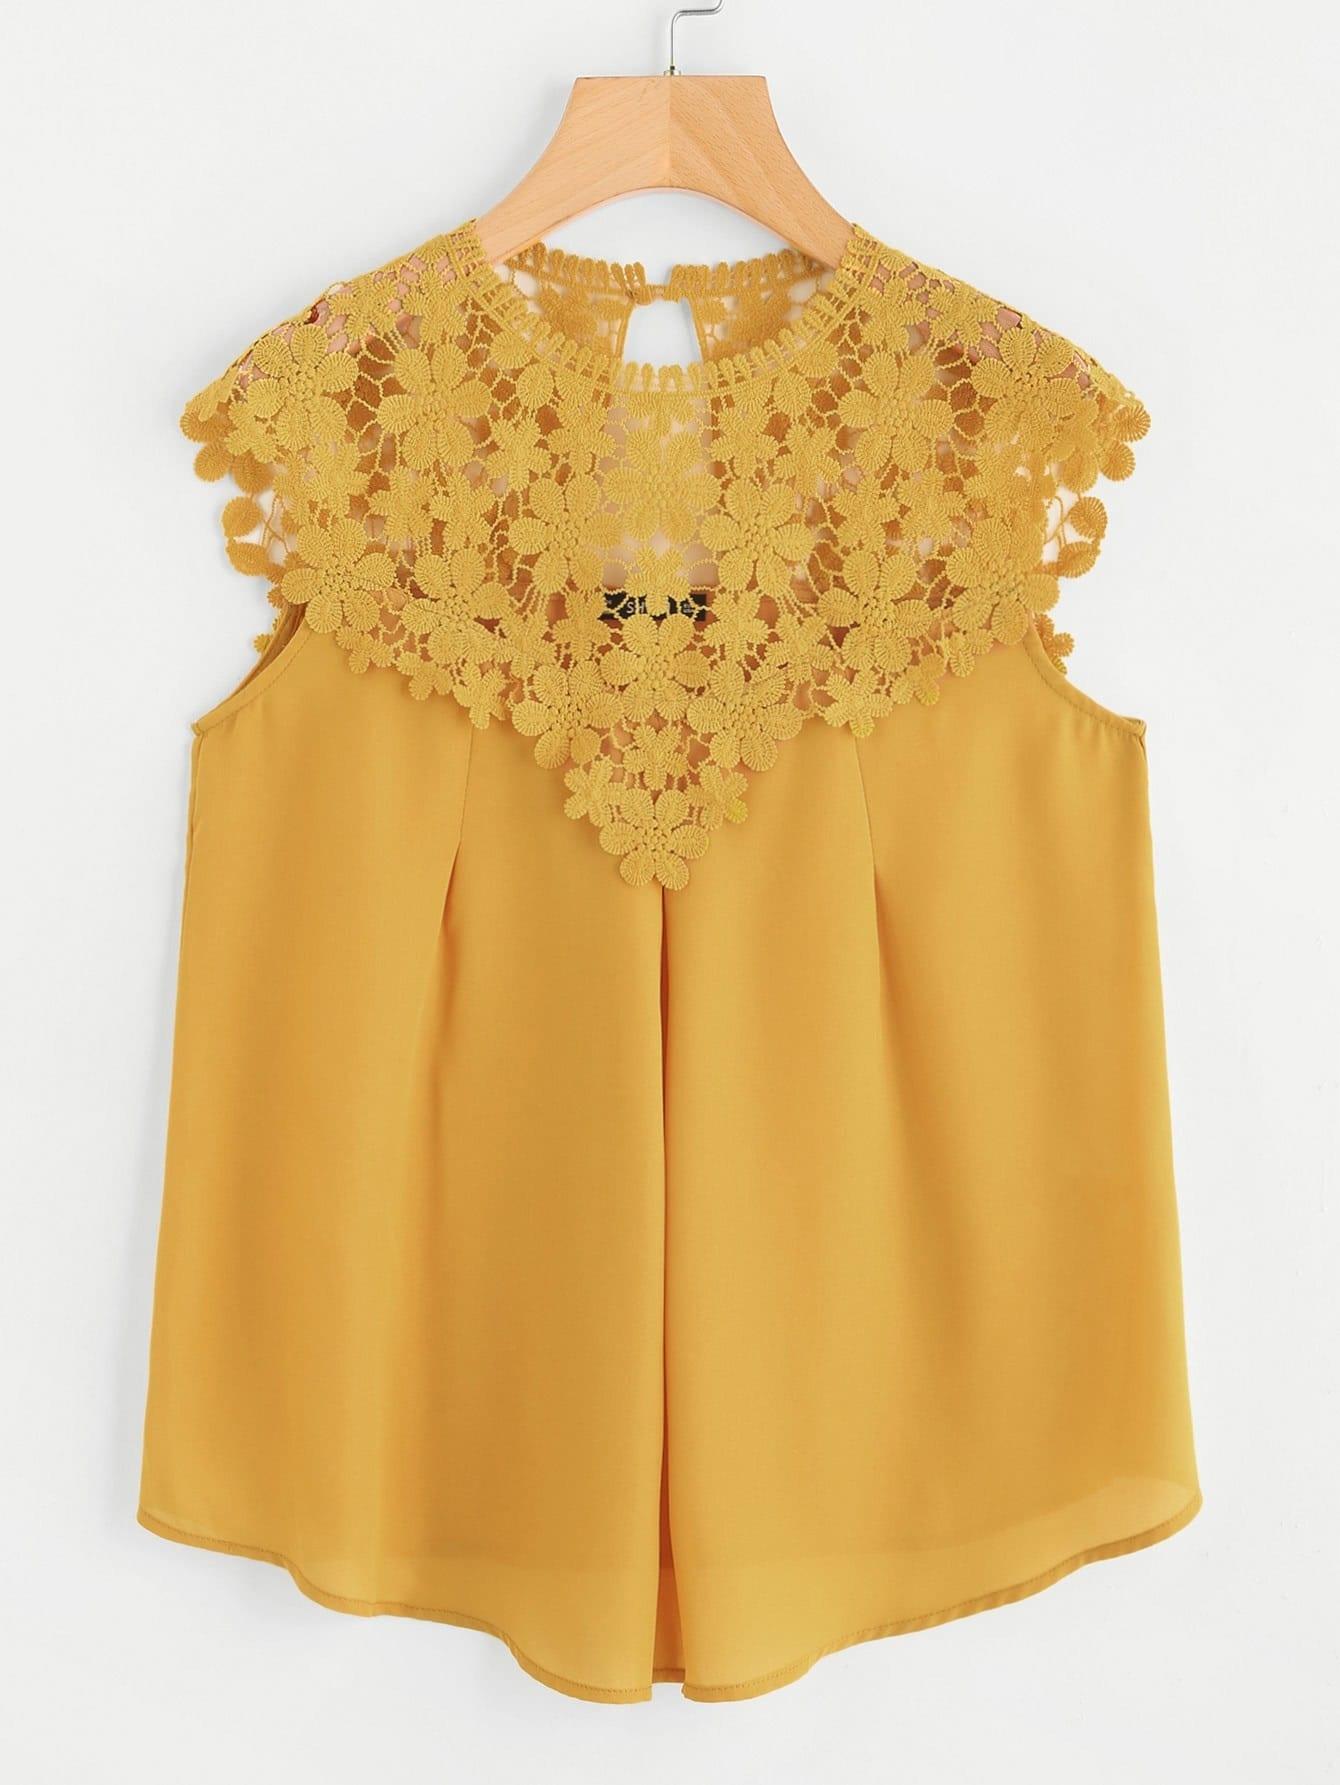 Keyhole Back Daisy Lace Shoulder Shell Top blouse171026705